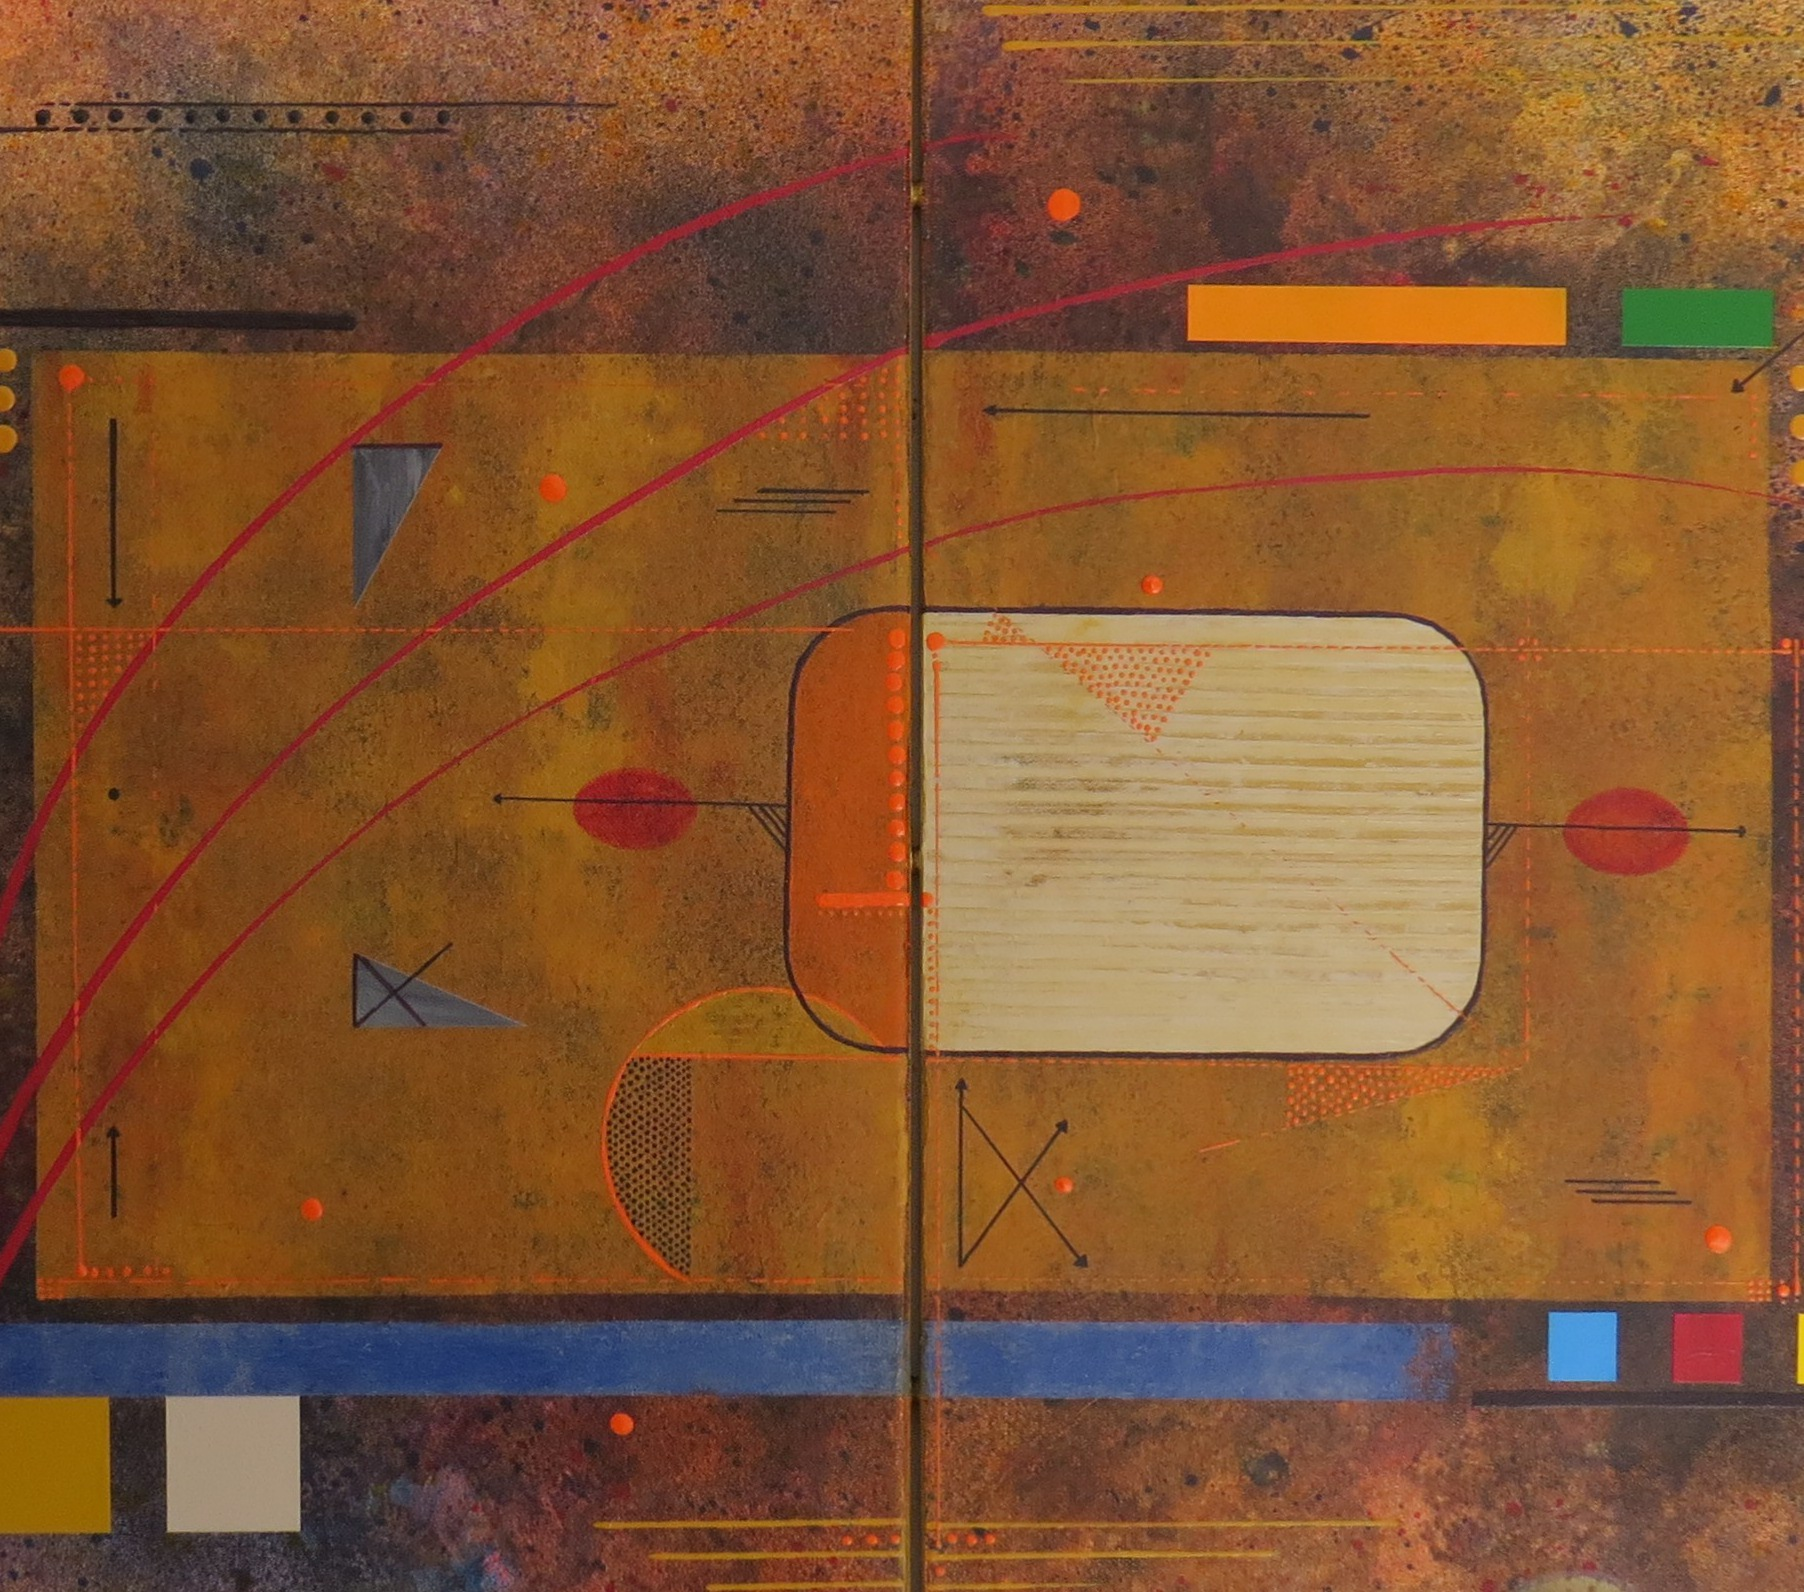 kappa - zoom5 - DALUZ GALEGO - peinture abstraite